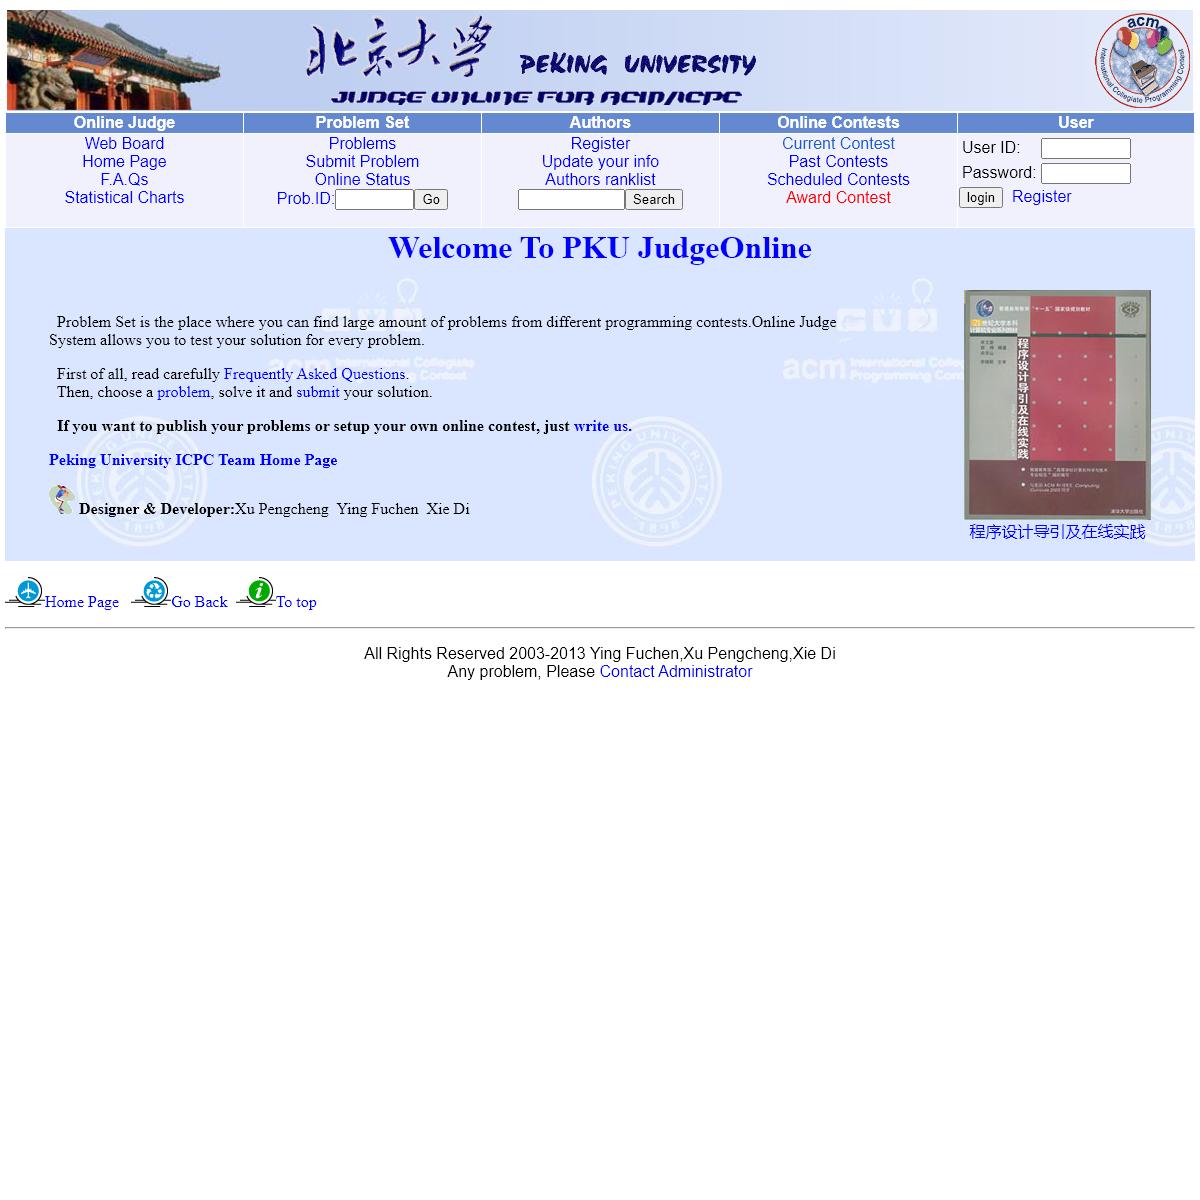 Welcome To PKU JudgeOnline